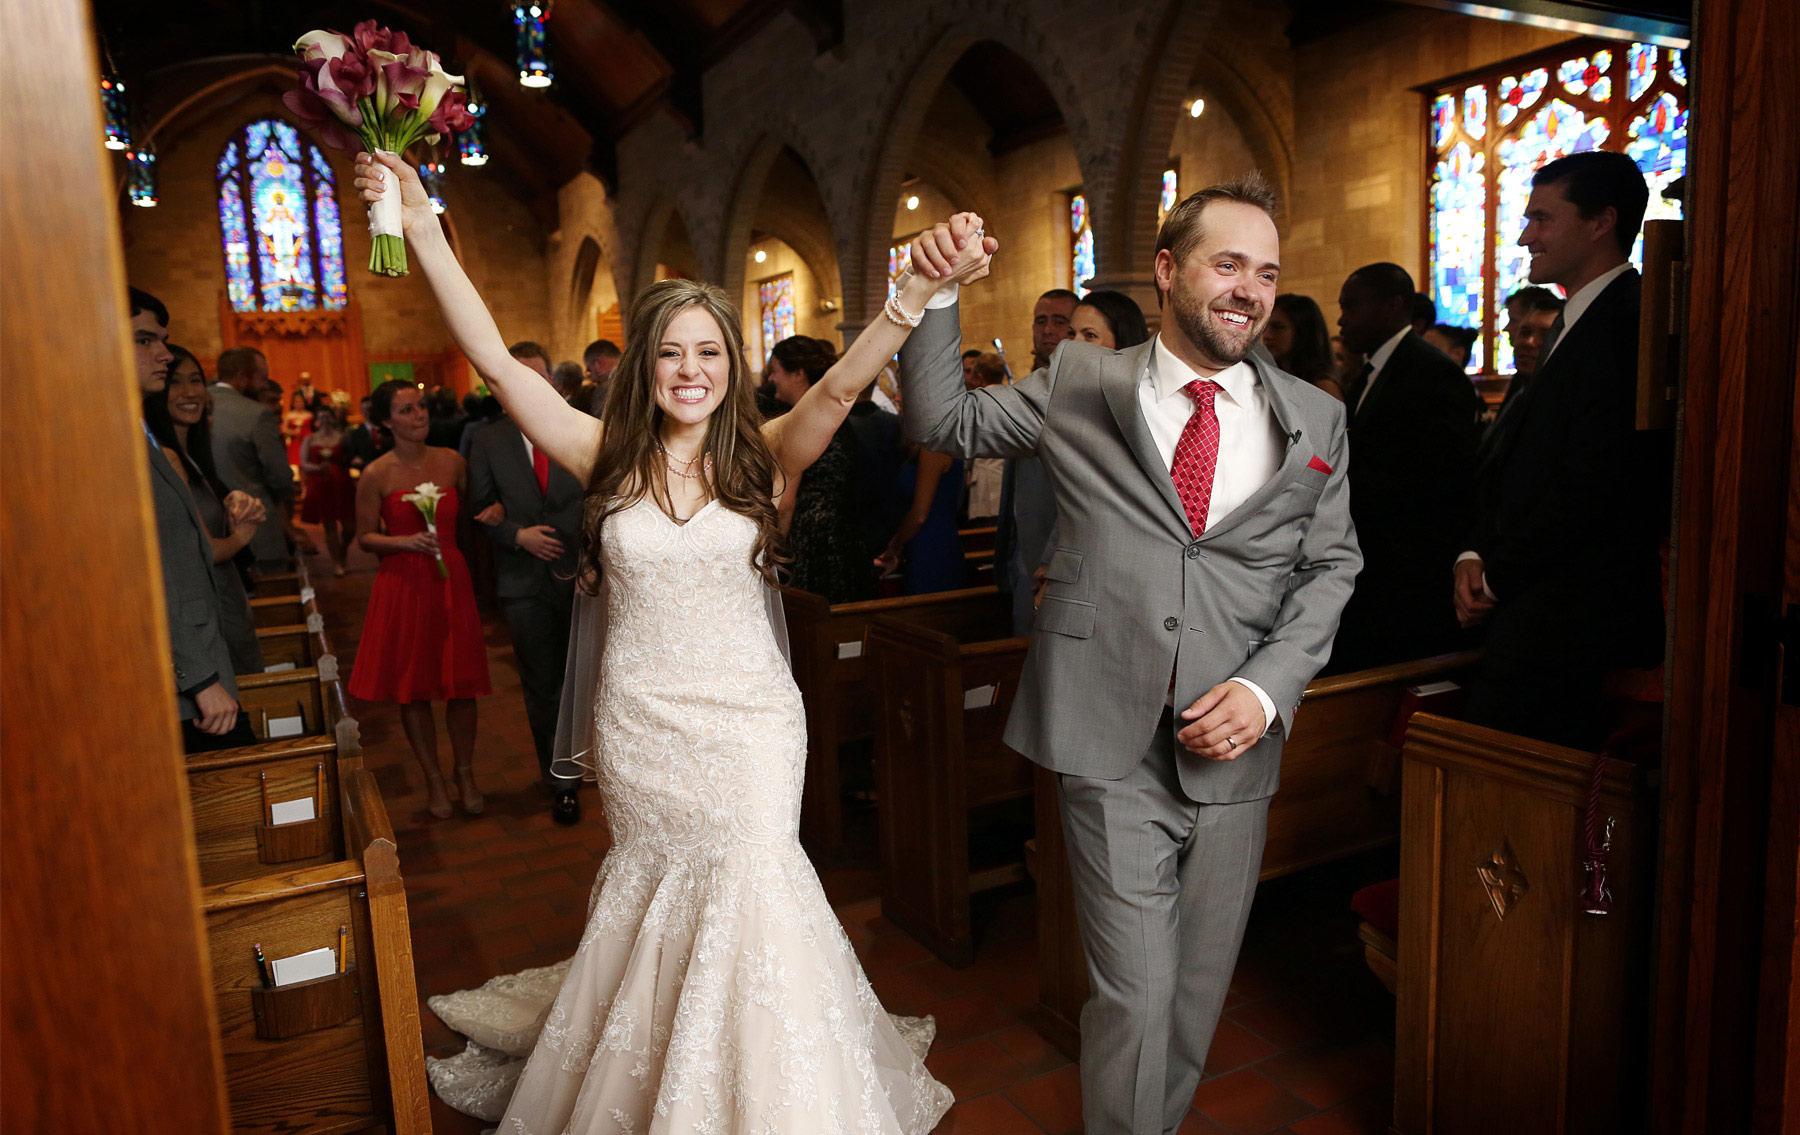 14-Minneapolis-Minnesota-Wedding-Photographer-by-Andrew-Vick-Photography-Summer-Diamond-Lake-Church-Ceremony-Celebration-Excited-Bride-Groom-Natalie-and-Andrew.jpg